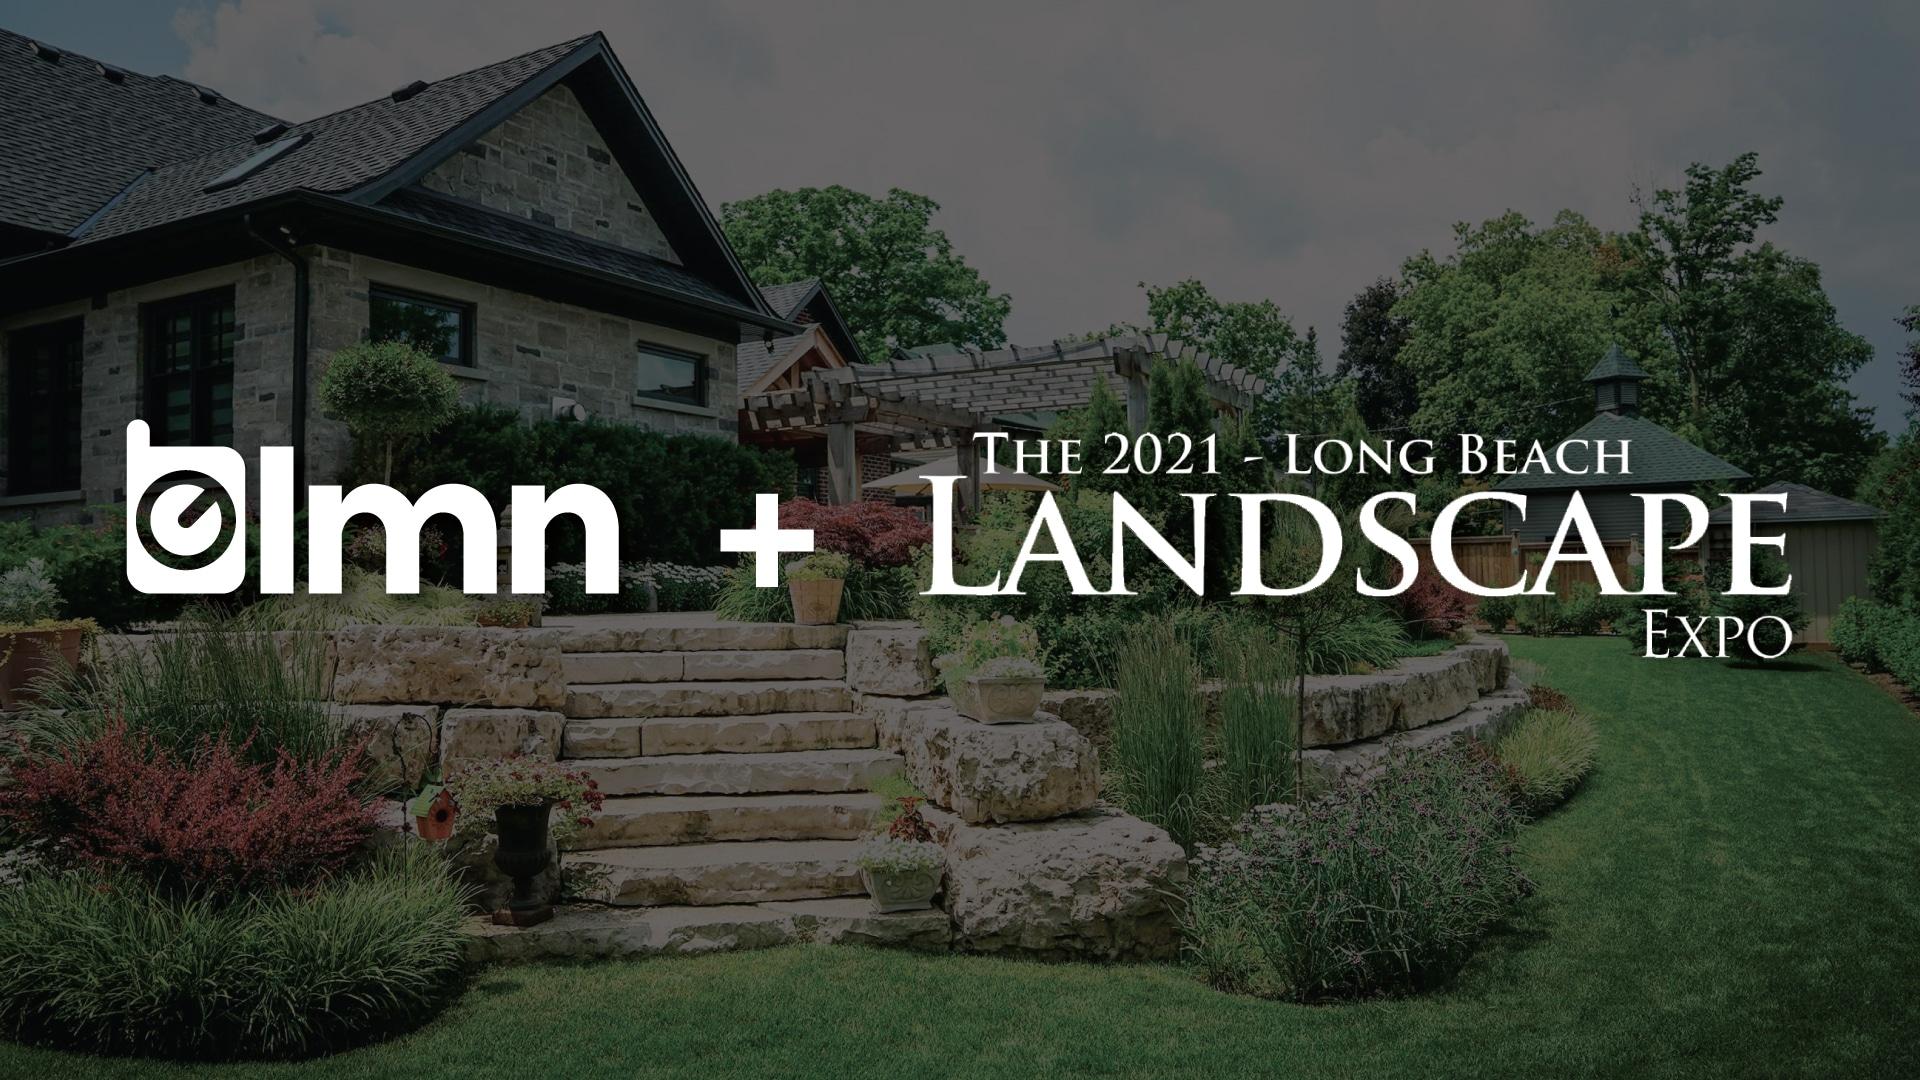 LB-LandscapeExpo-HeaderImage